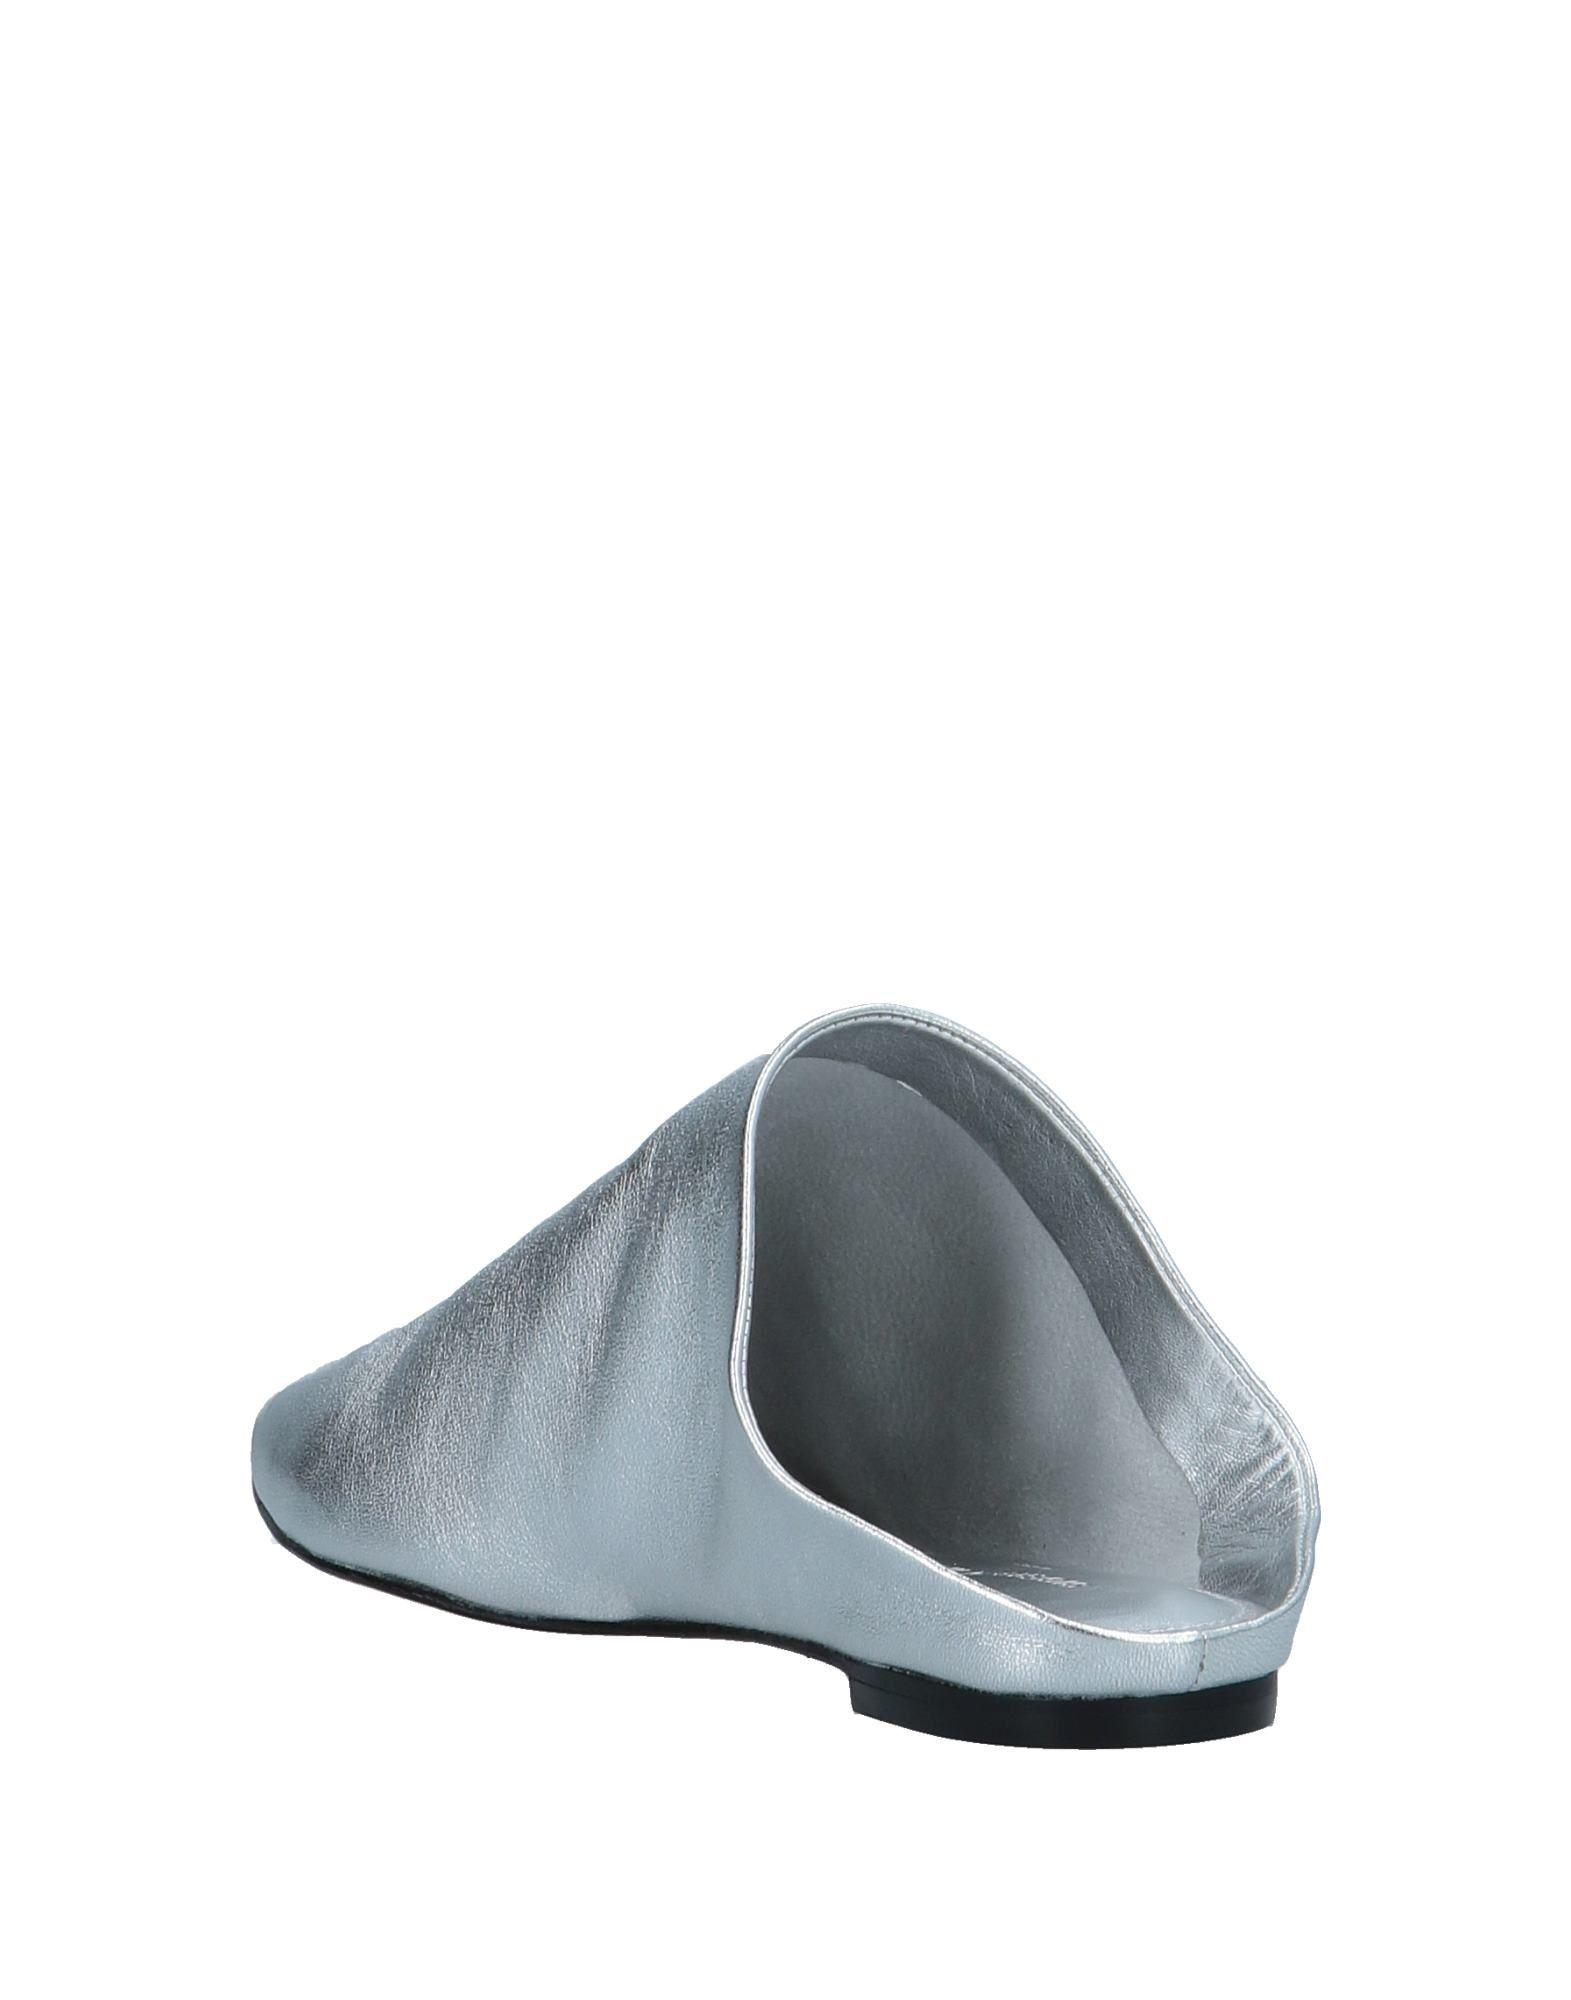 Stilvolle billige Schuhe Damen Sigerson Morrison Pantoletten Damen Schuhe  11564622KK bdb6ed